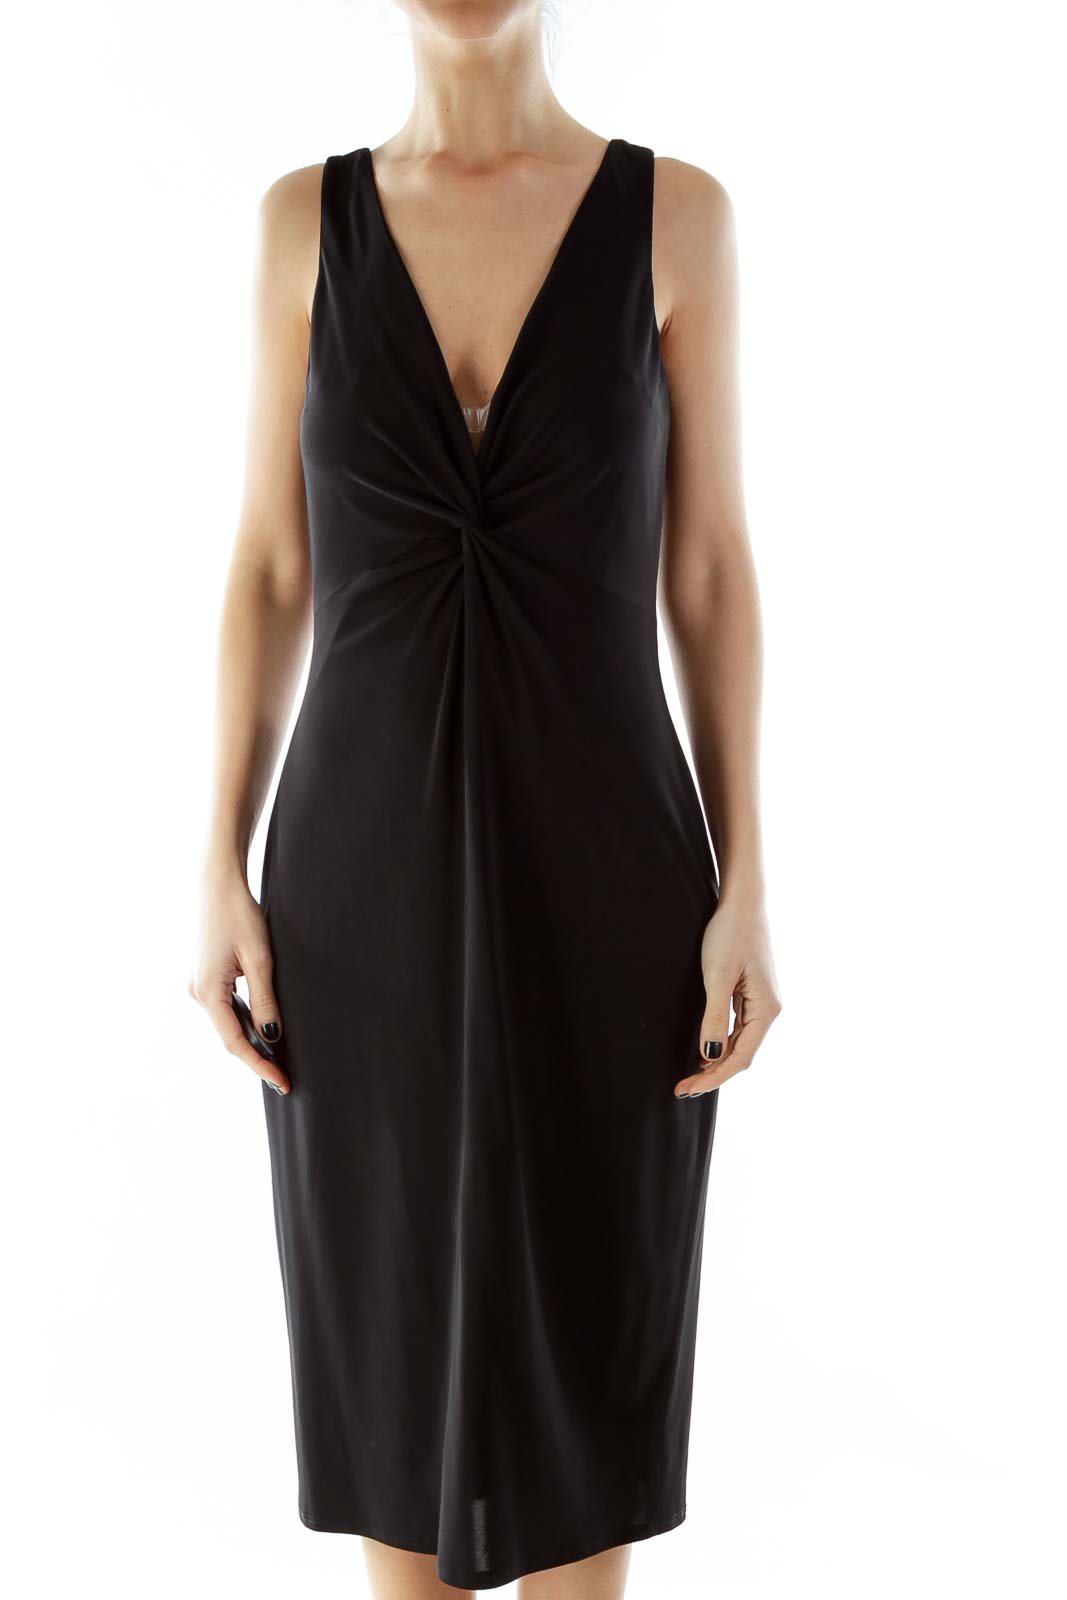 Black V-Neck Cocktail Dress With Knot